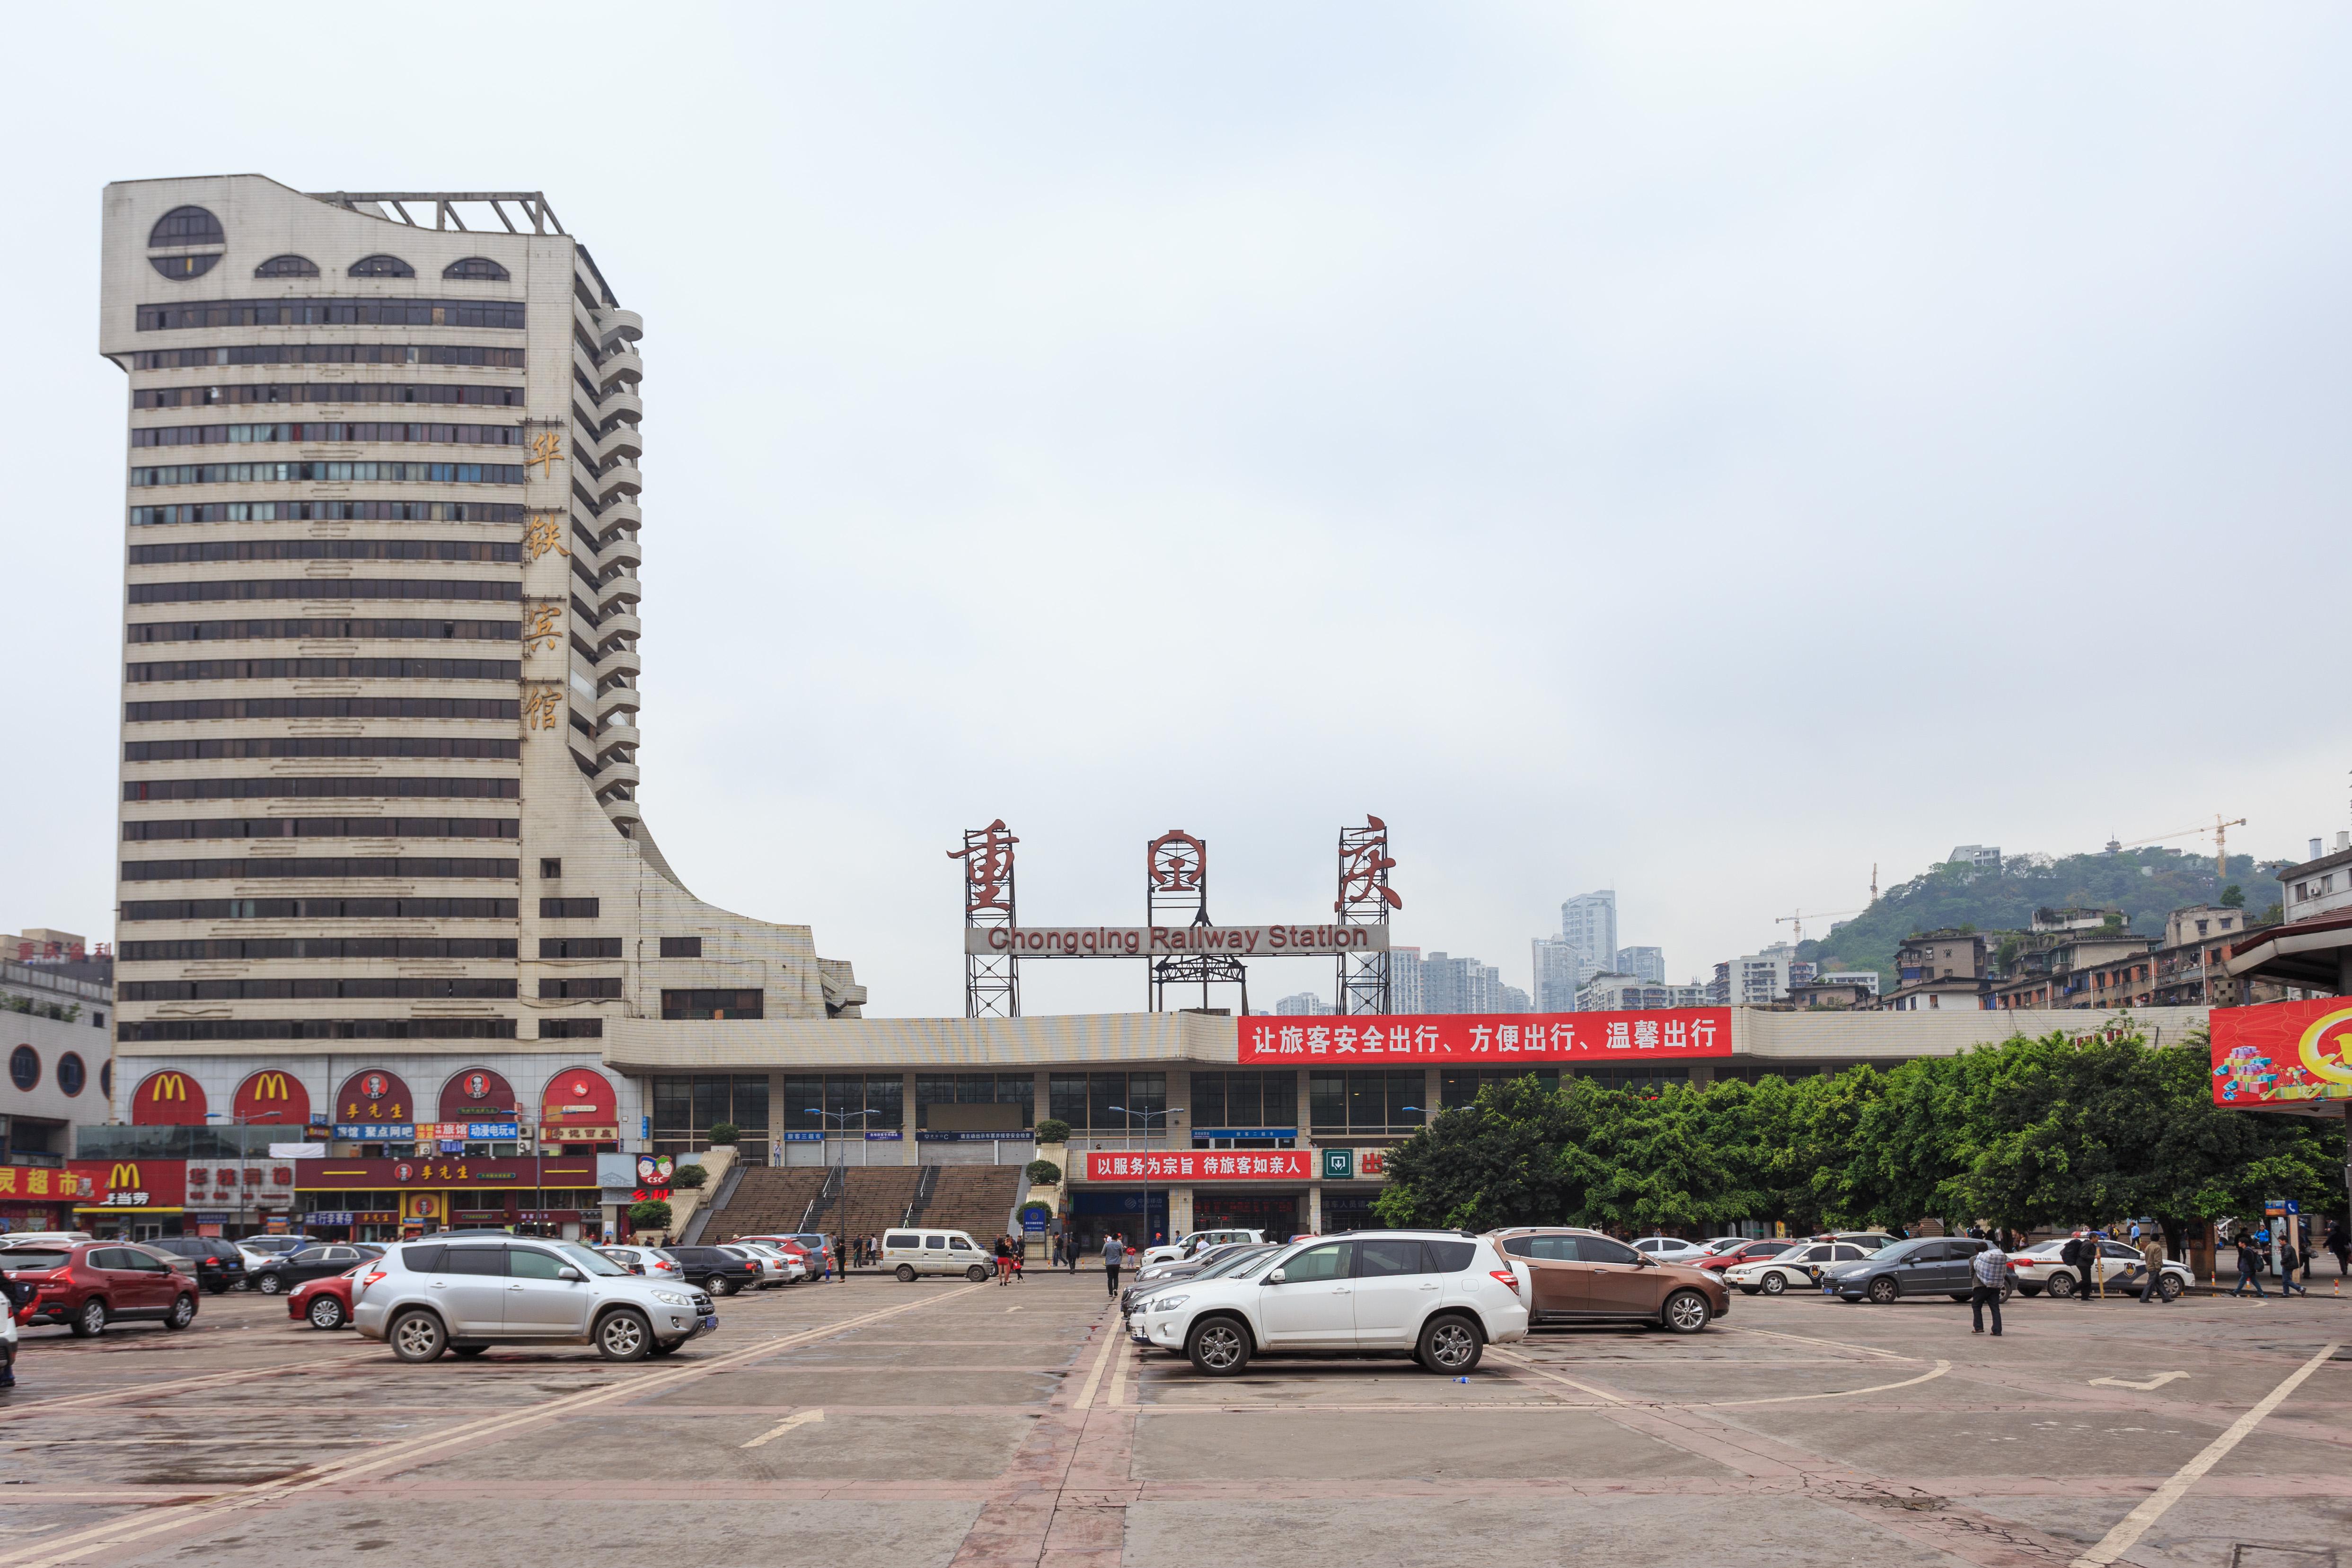 Chongqing (stacja kolejowa)